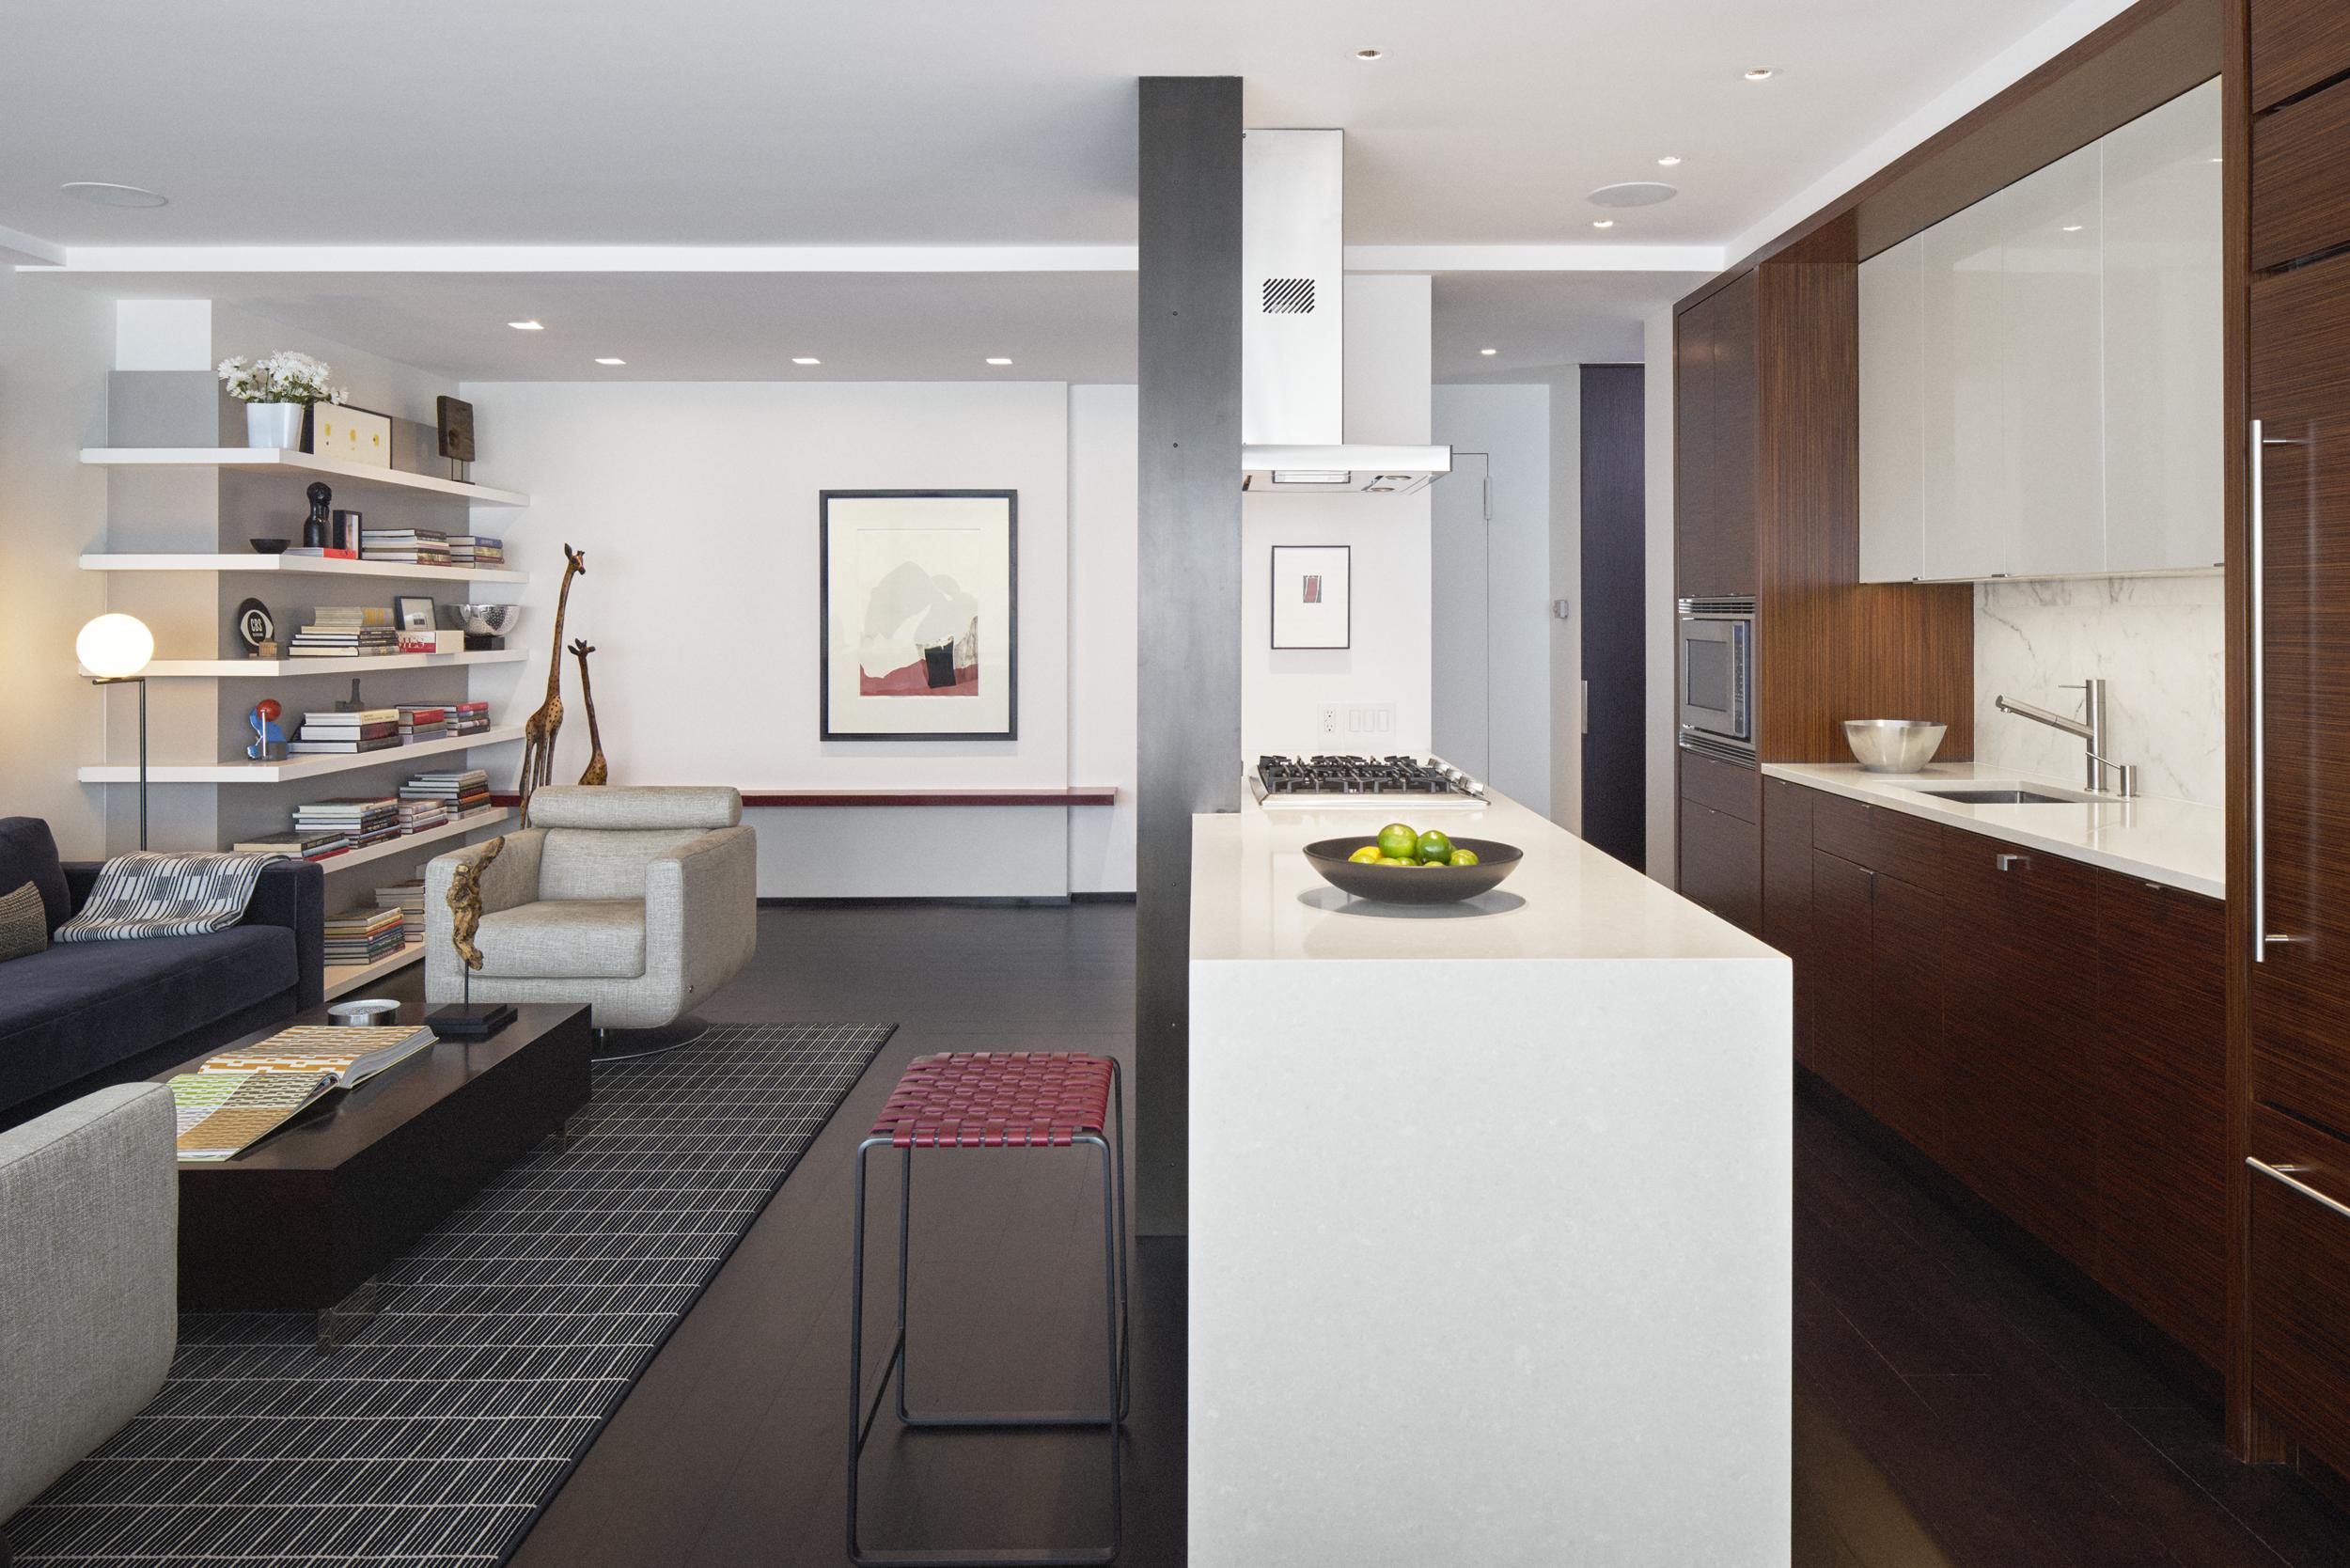 Lincoln Square Residence Kitchen Design